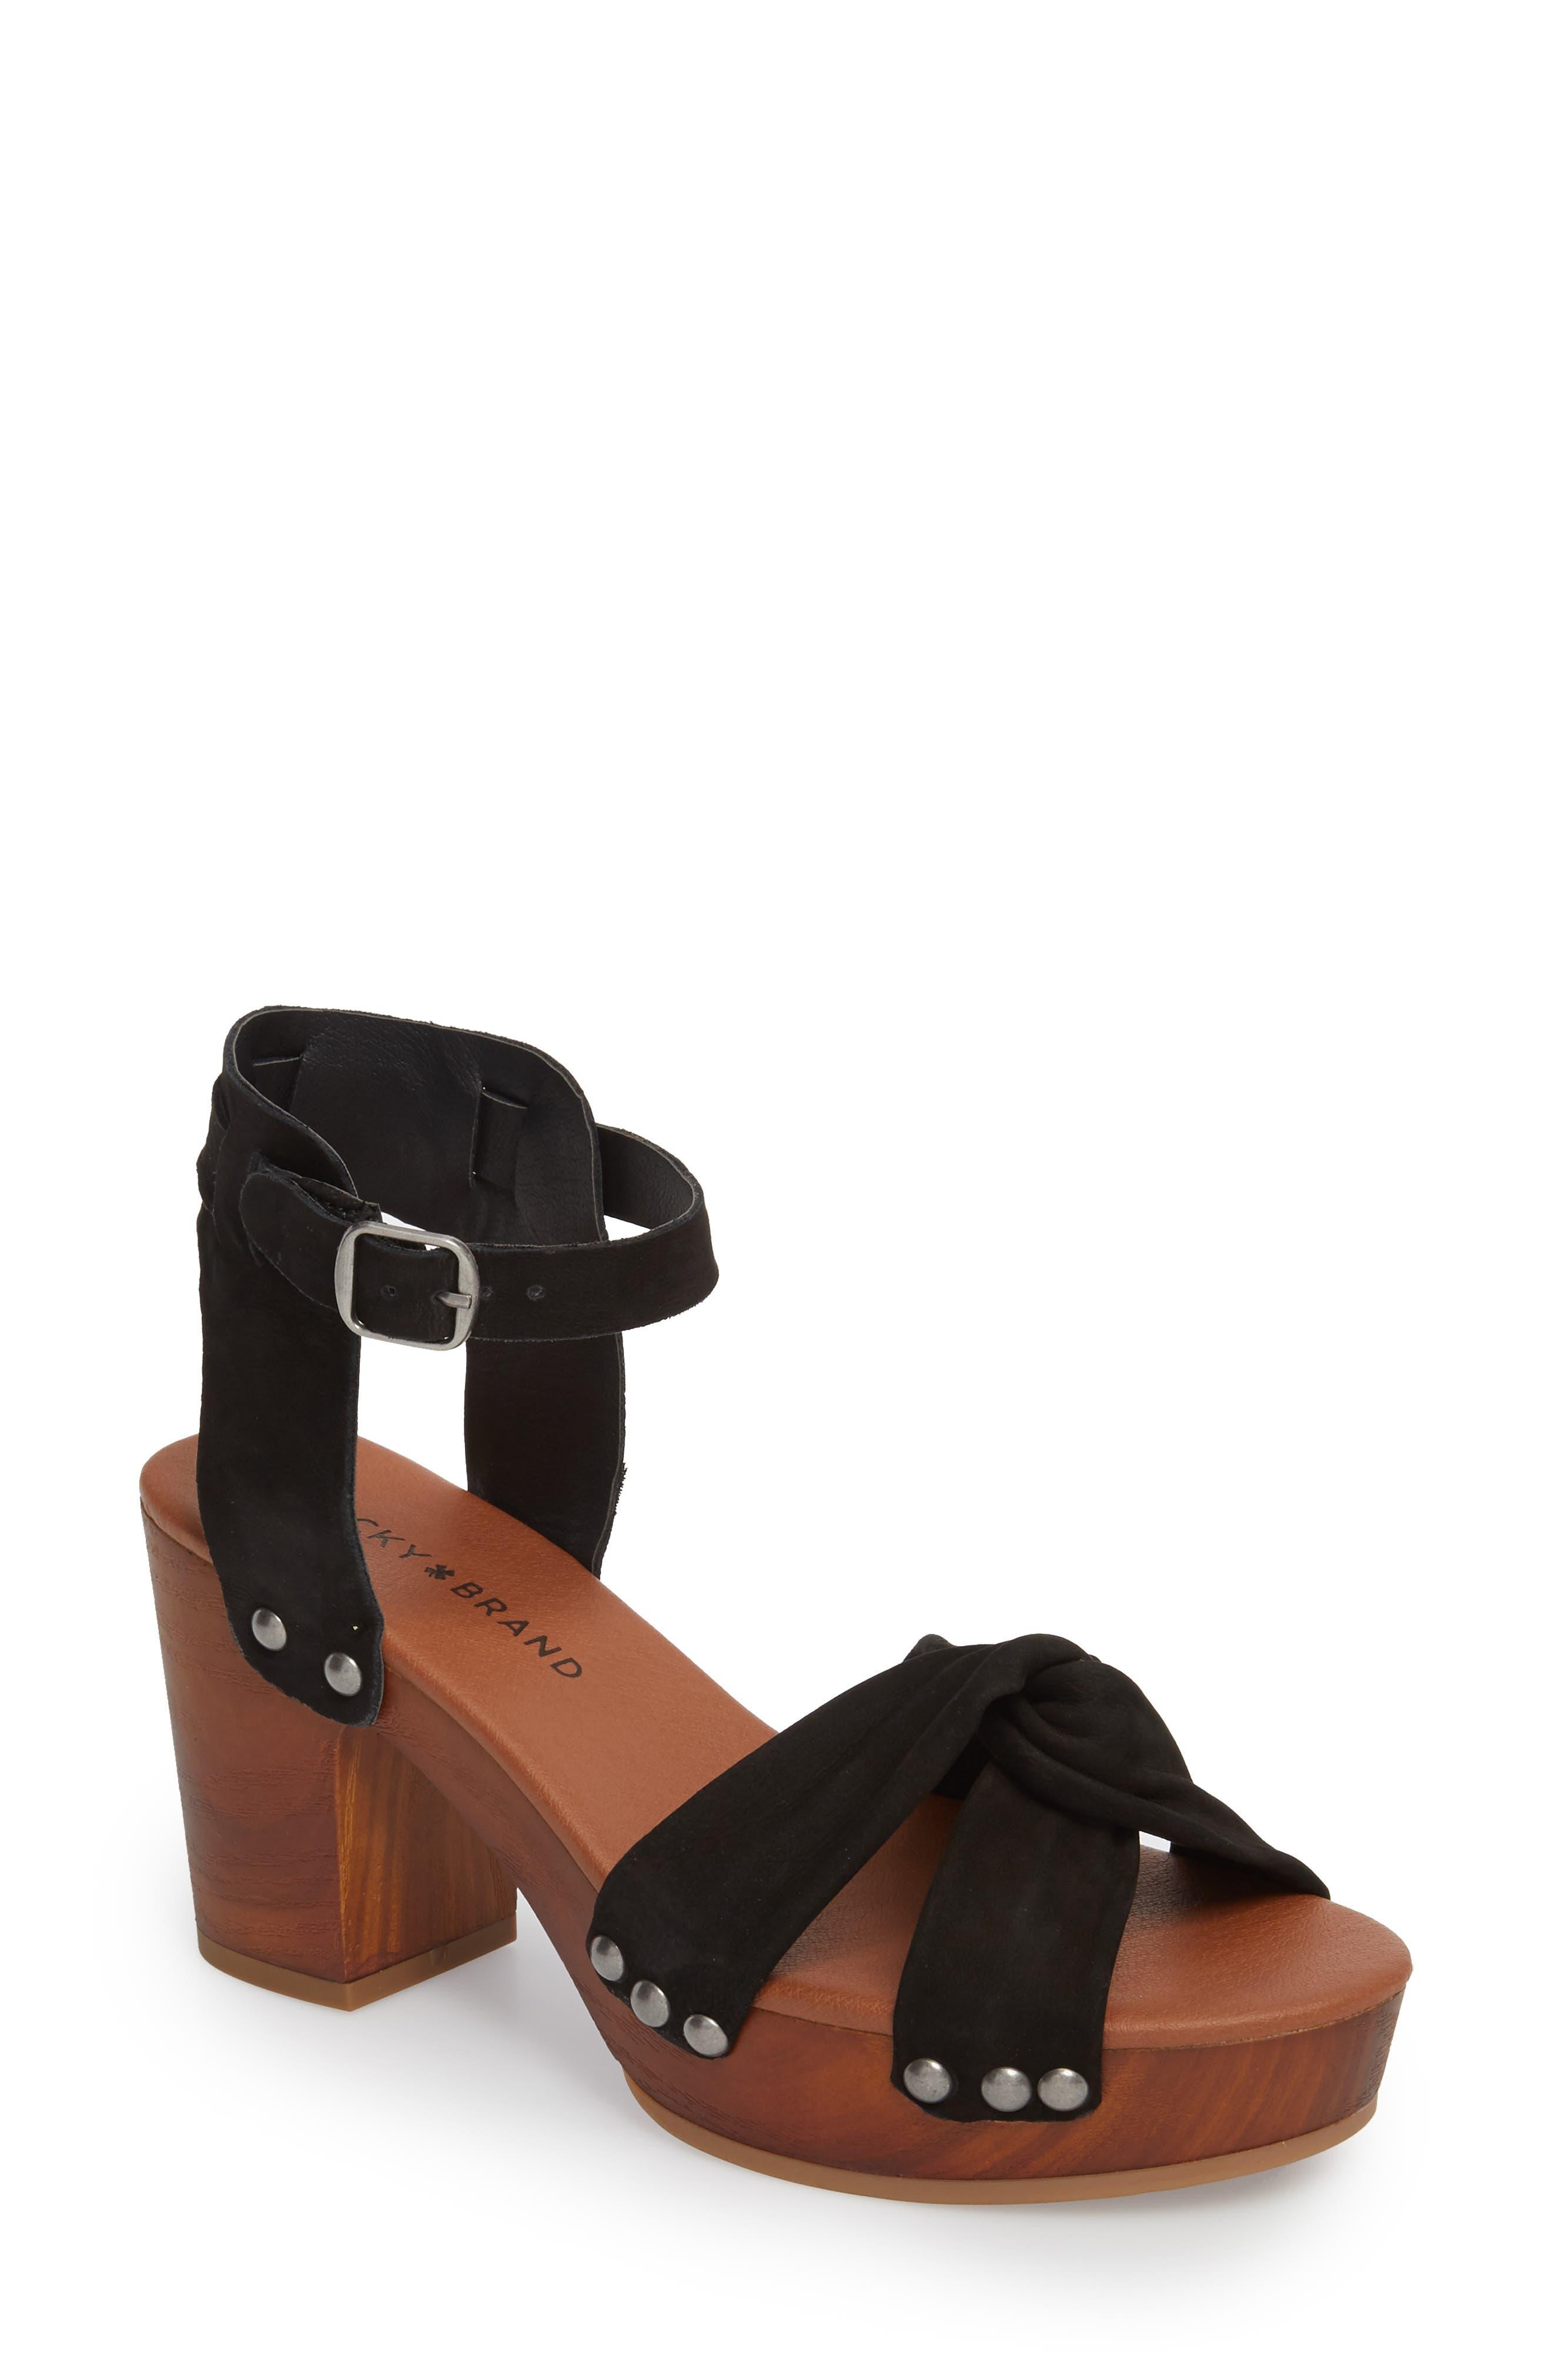 Whitneigh Sandal,                         Main,                         color,